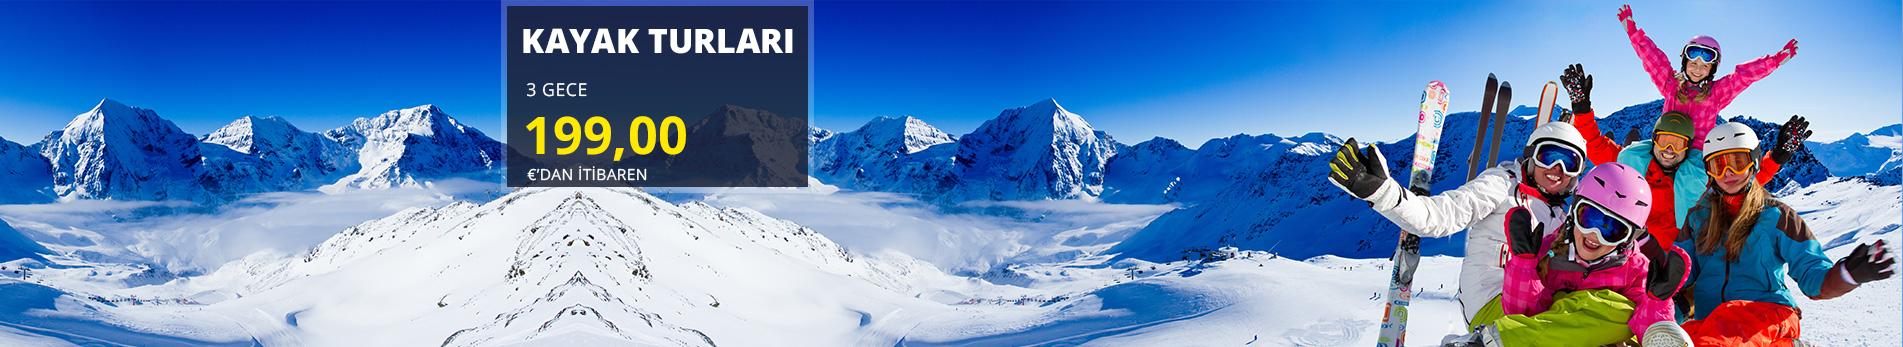 yurtdisi-touristica-kayak-turlari